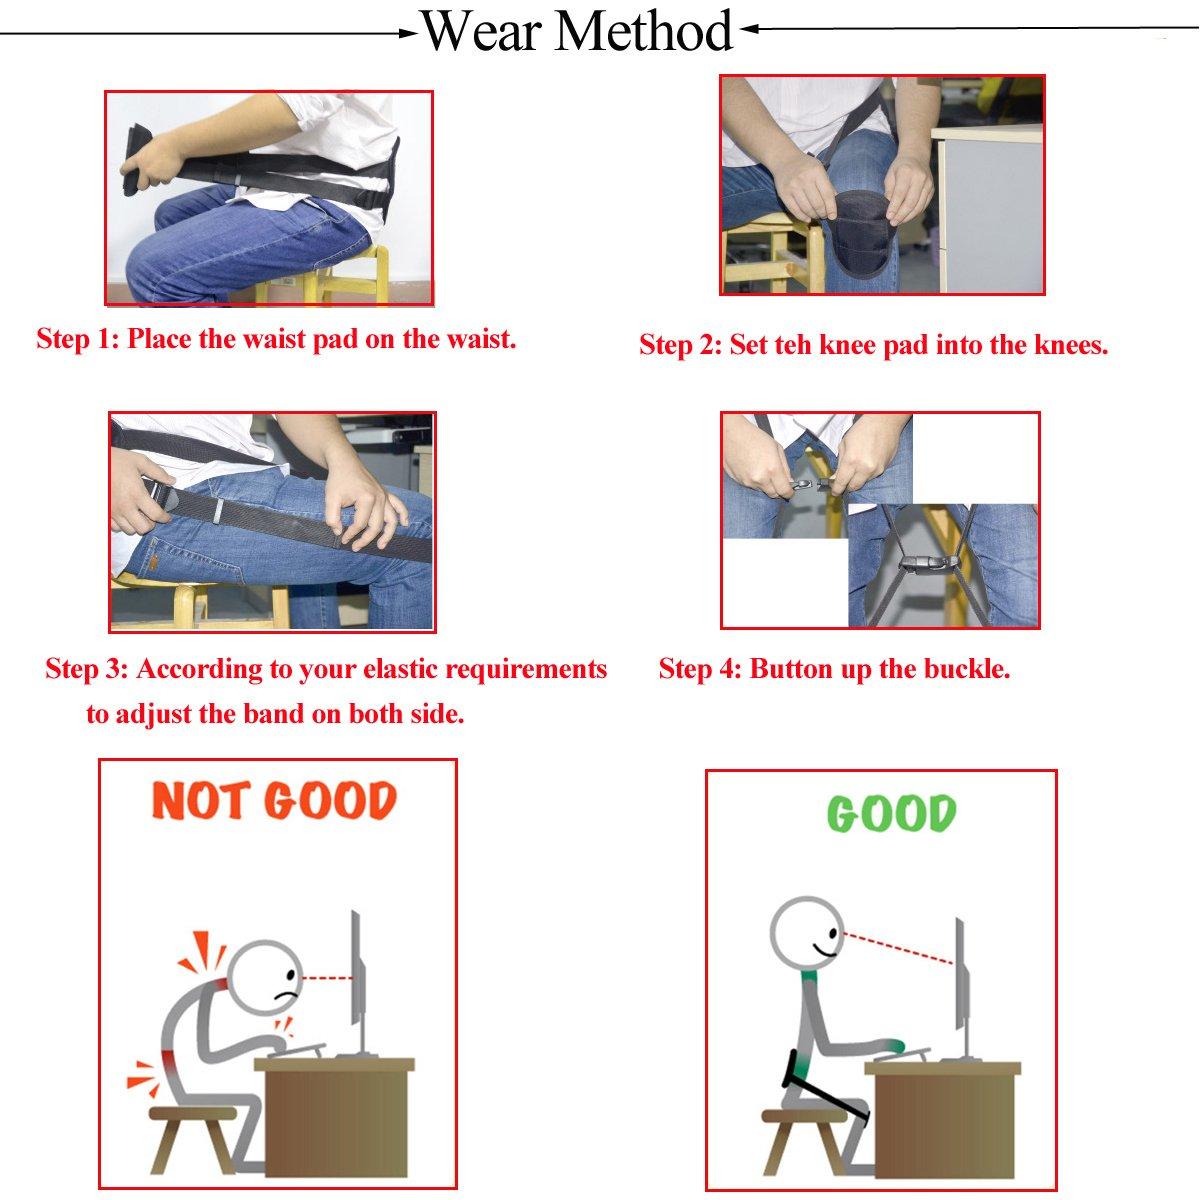 Ueasy Adjustable Back Posture Corrector Brace Clavicle Brace Portable Correct Back Posture for Correction Posture Enhance Temperament by Ueasy (Image #5)